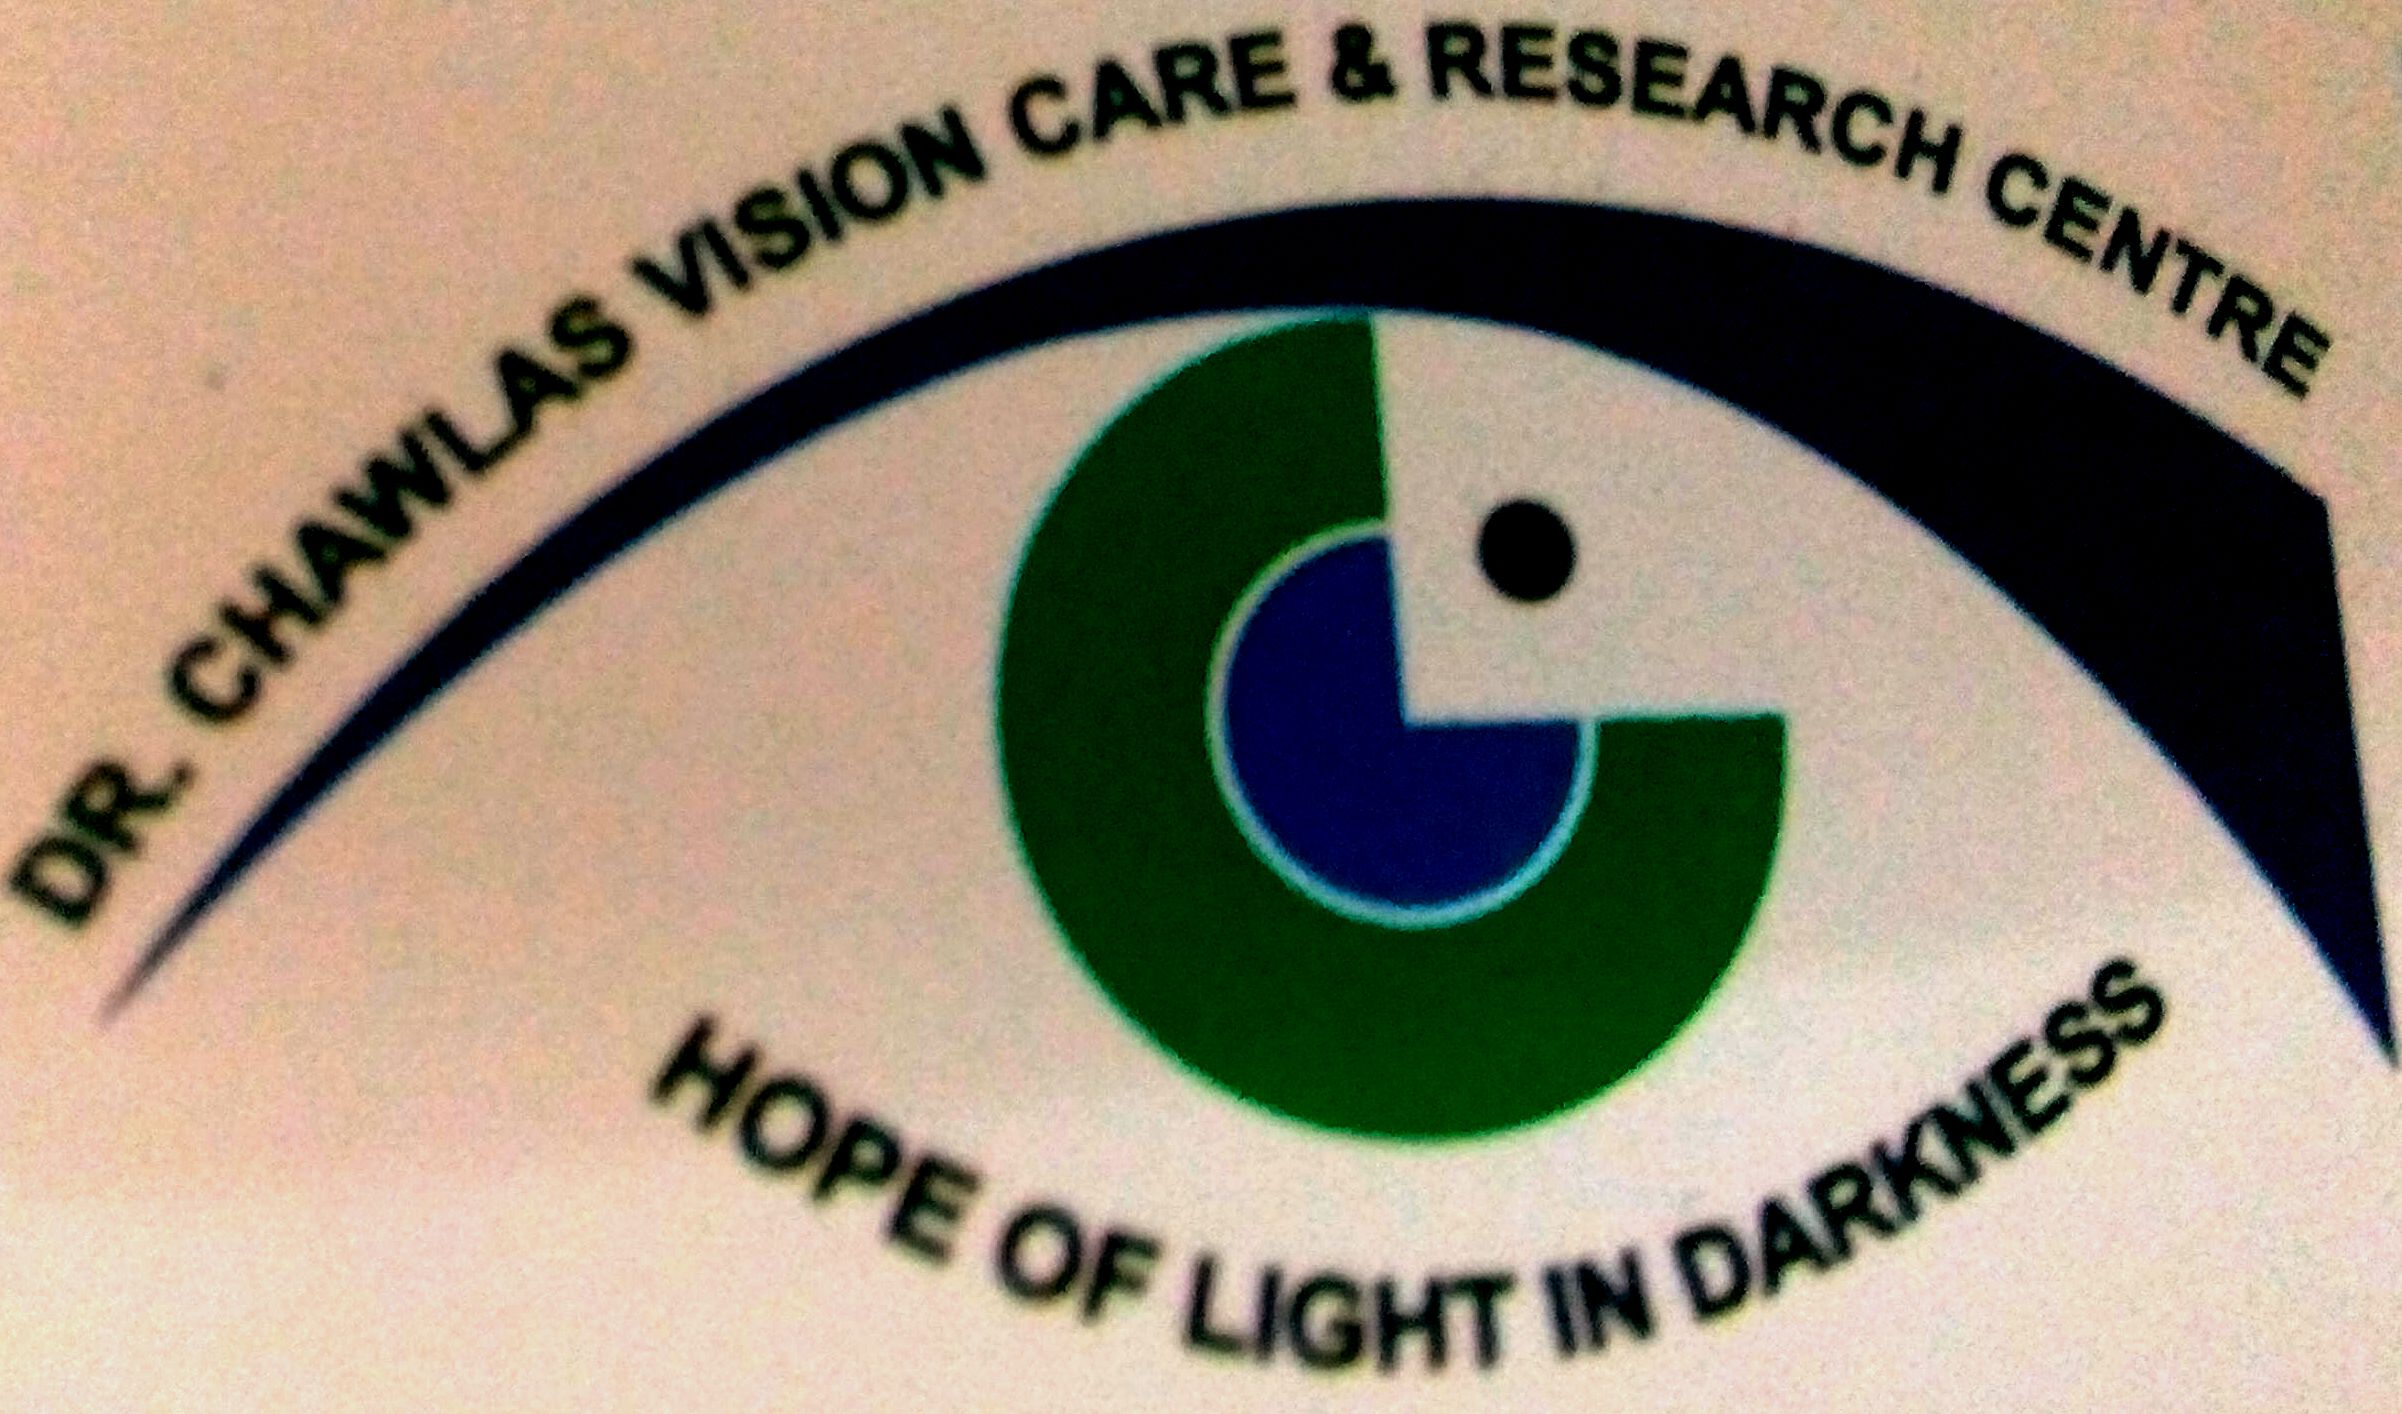 Vision Care Clinic & Research Centre